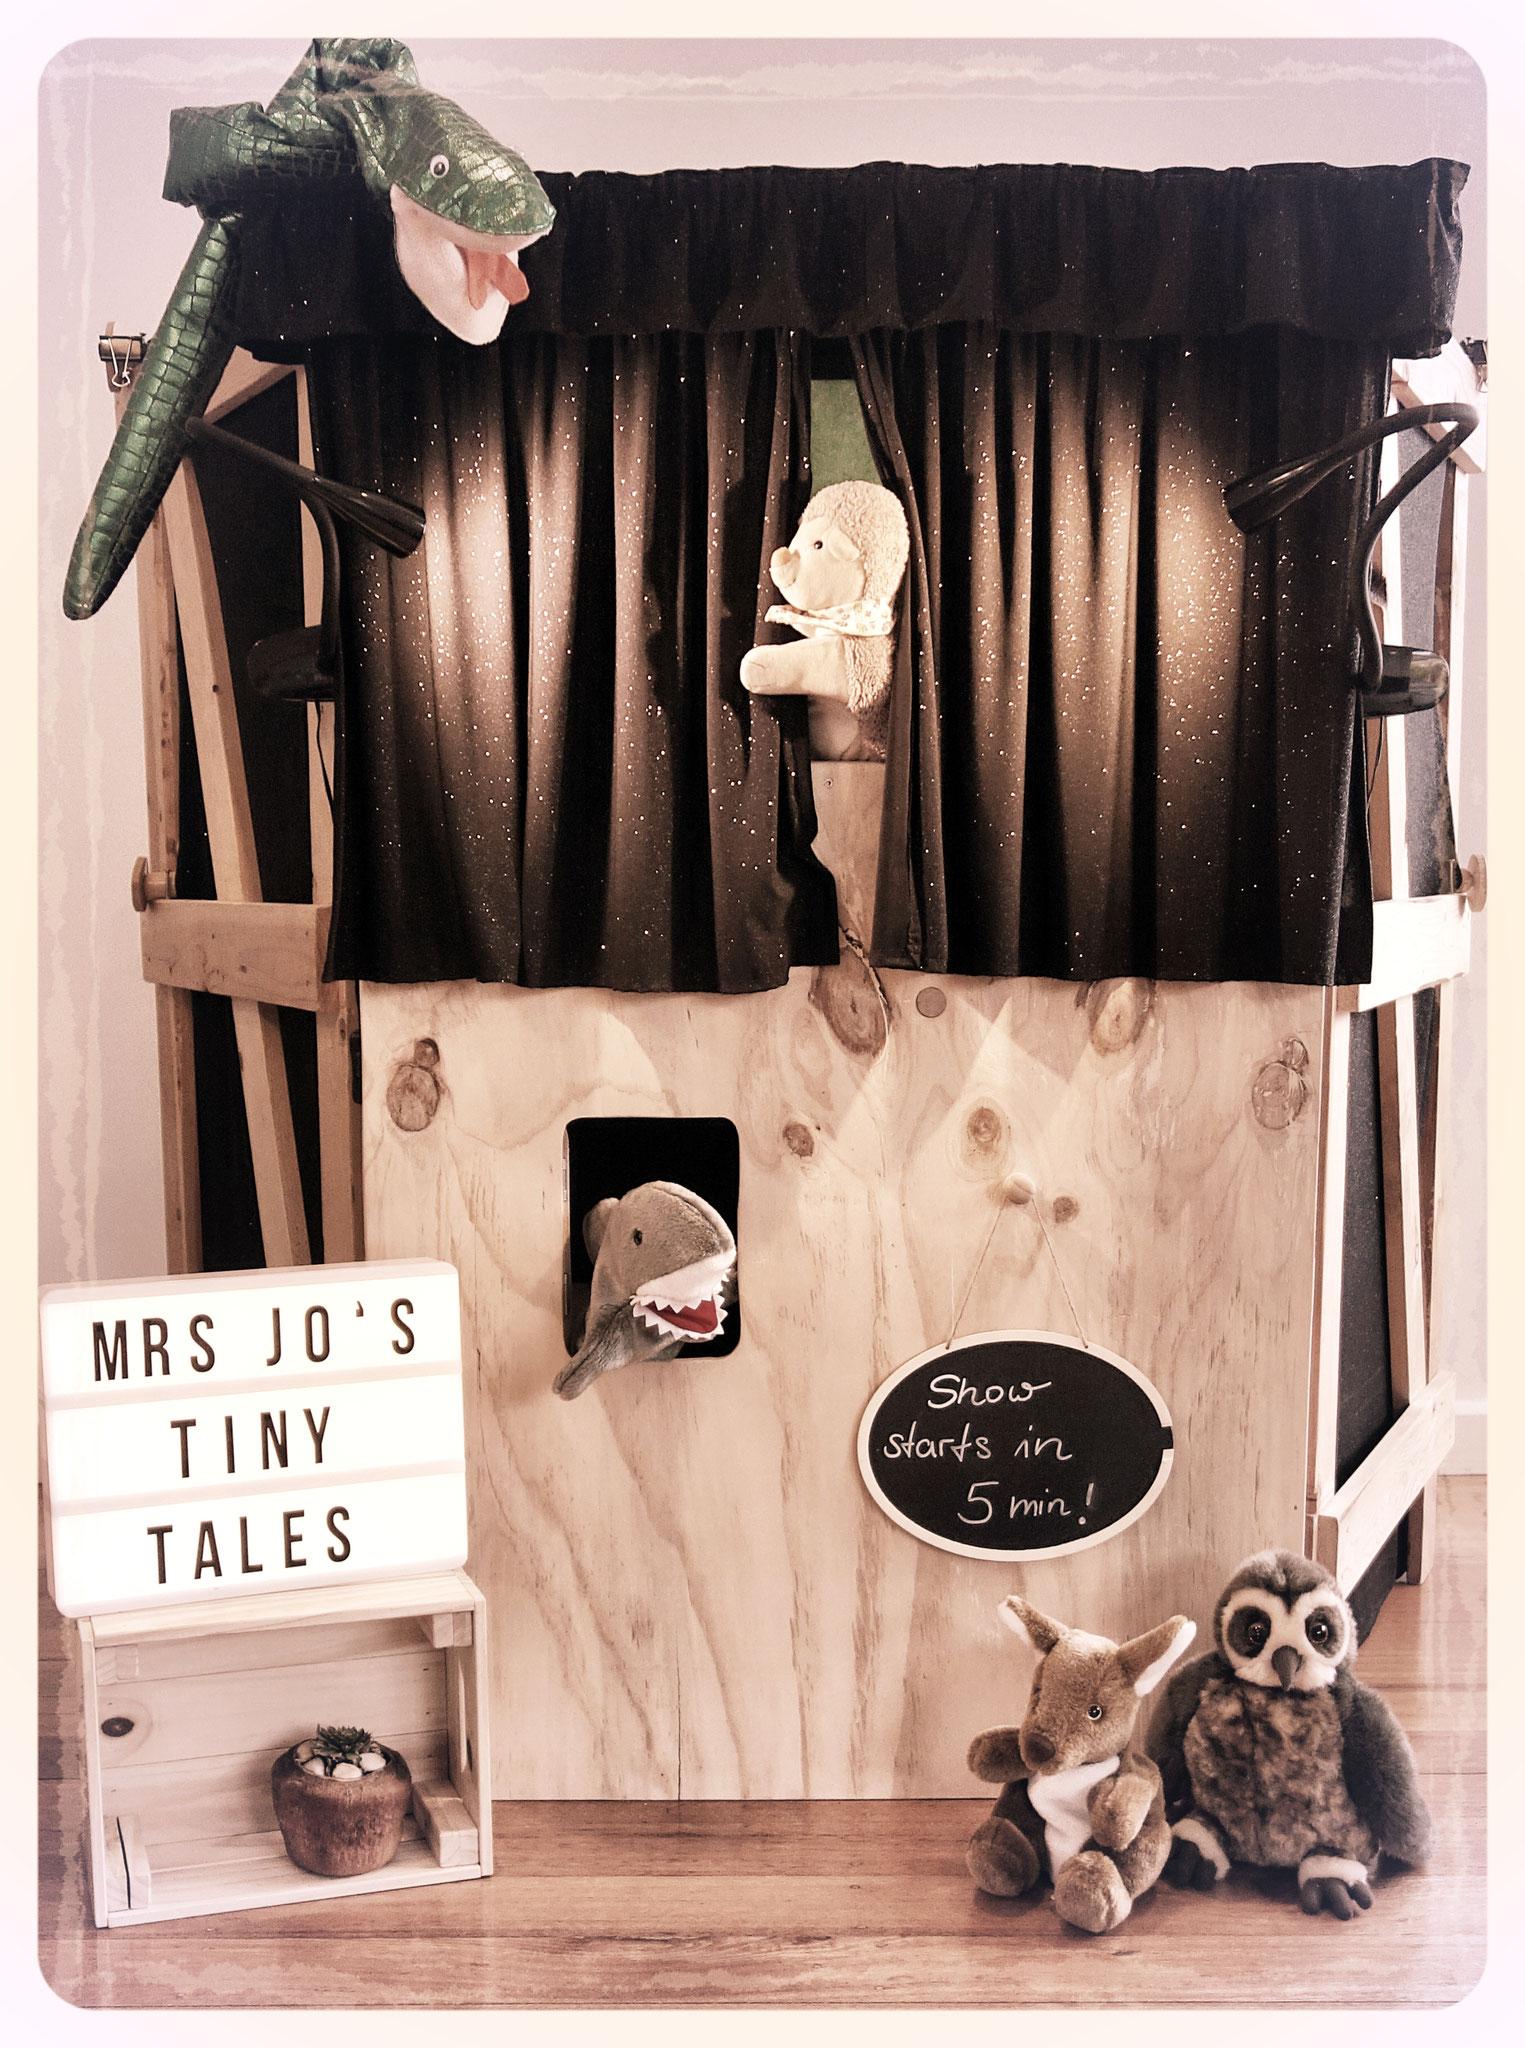 Mrs Jo's Tiny Tales - puppet show incursion Melbourne